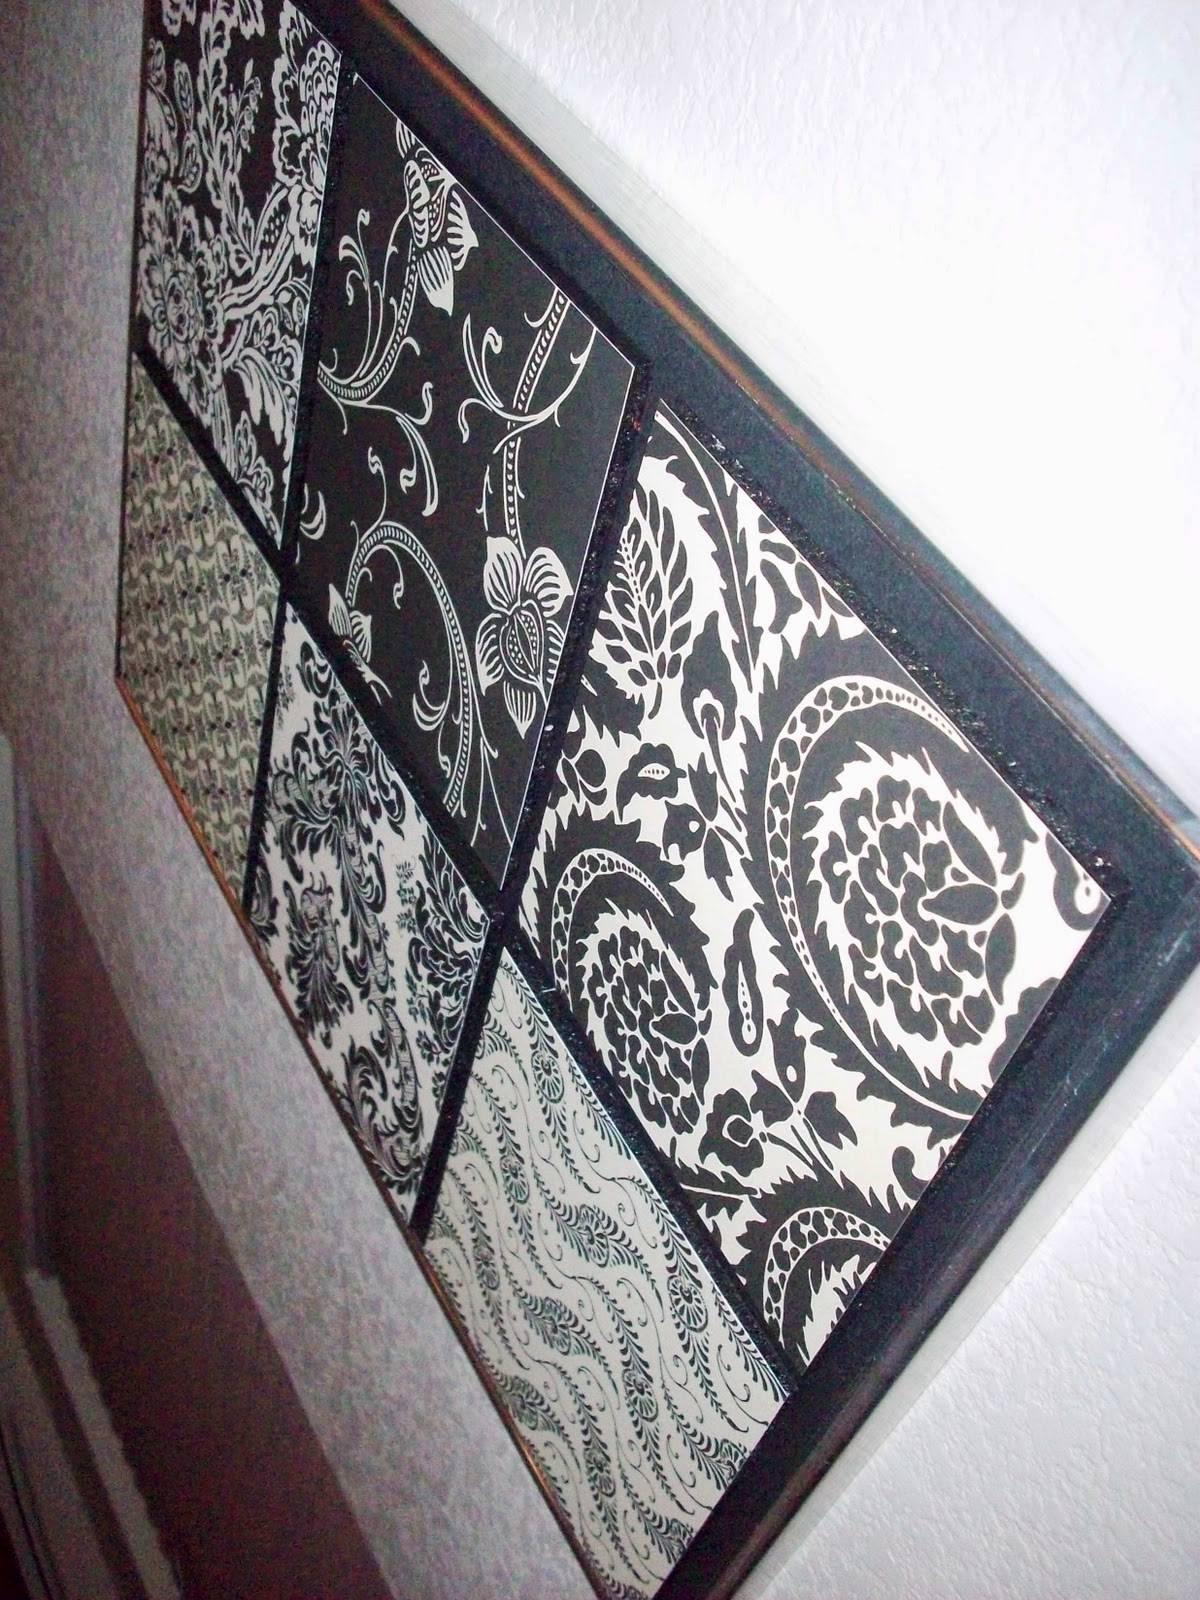 Scrapbook Paper 3D Wall Art Inside Most Current 3D Paper Wall Art (View 22 of 25)